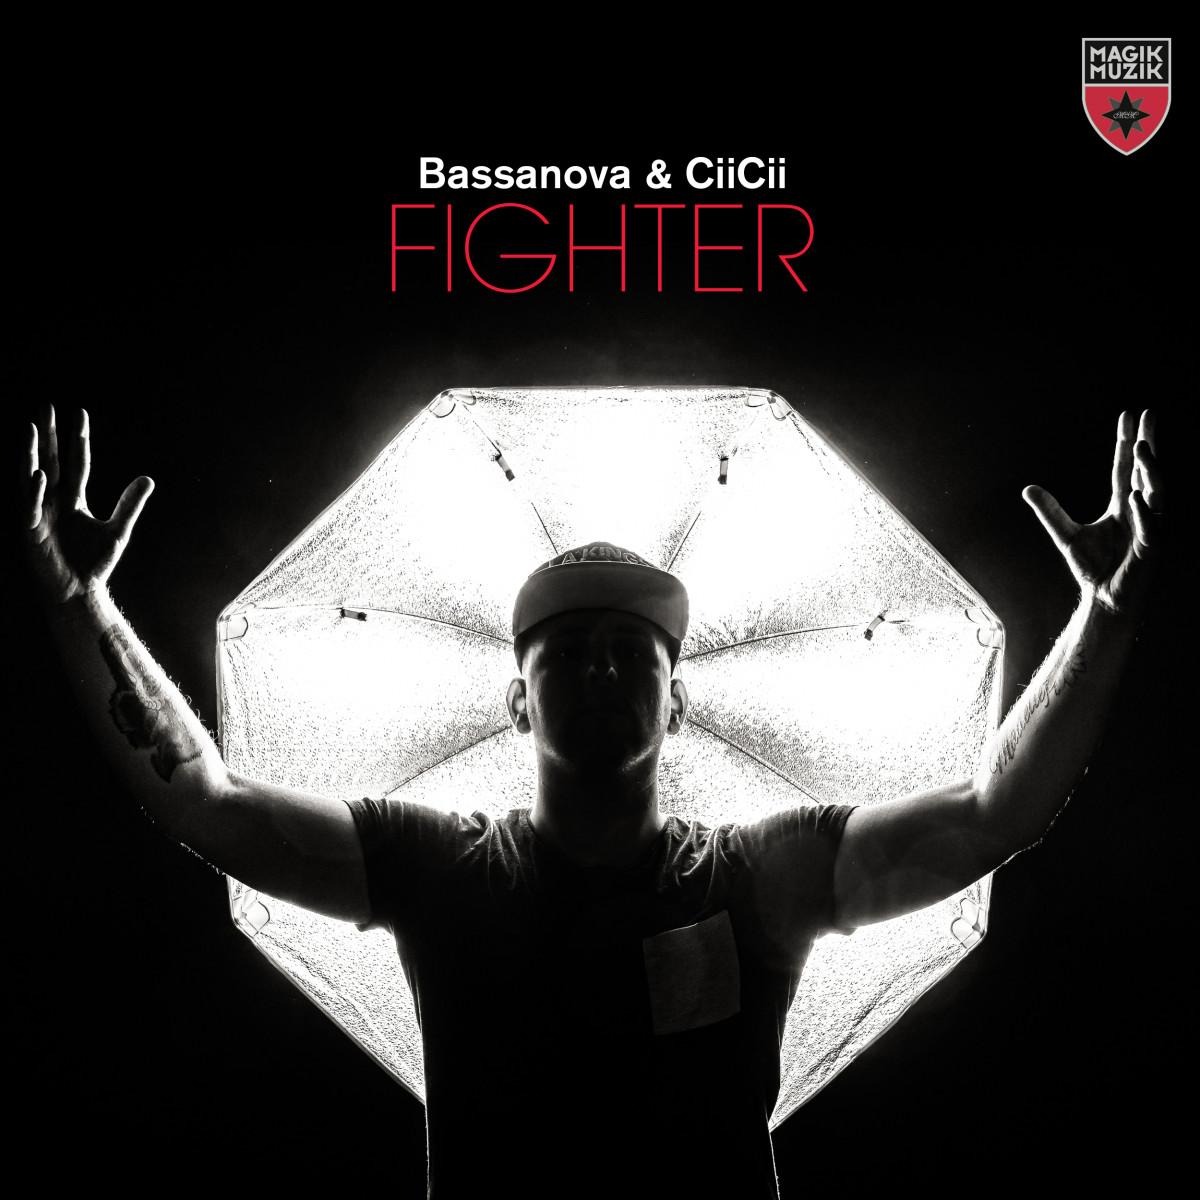 Bassanova & CiiCii - Fighter (Out Now on MAGIK MUZIK)